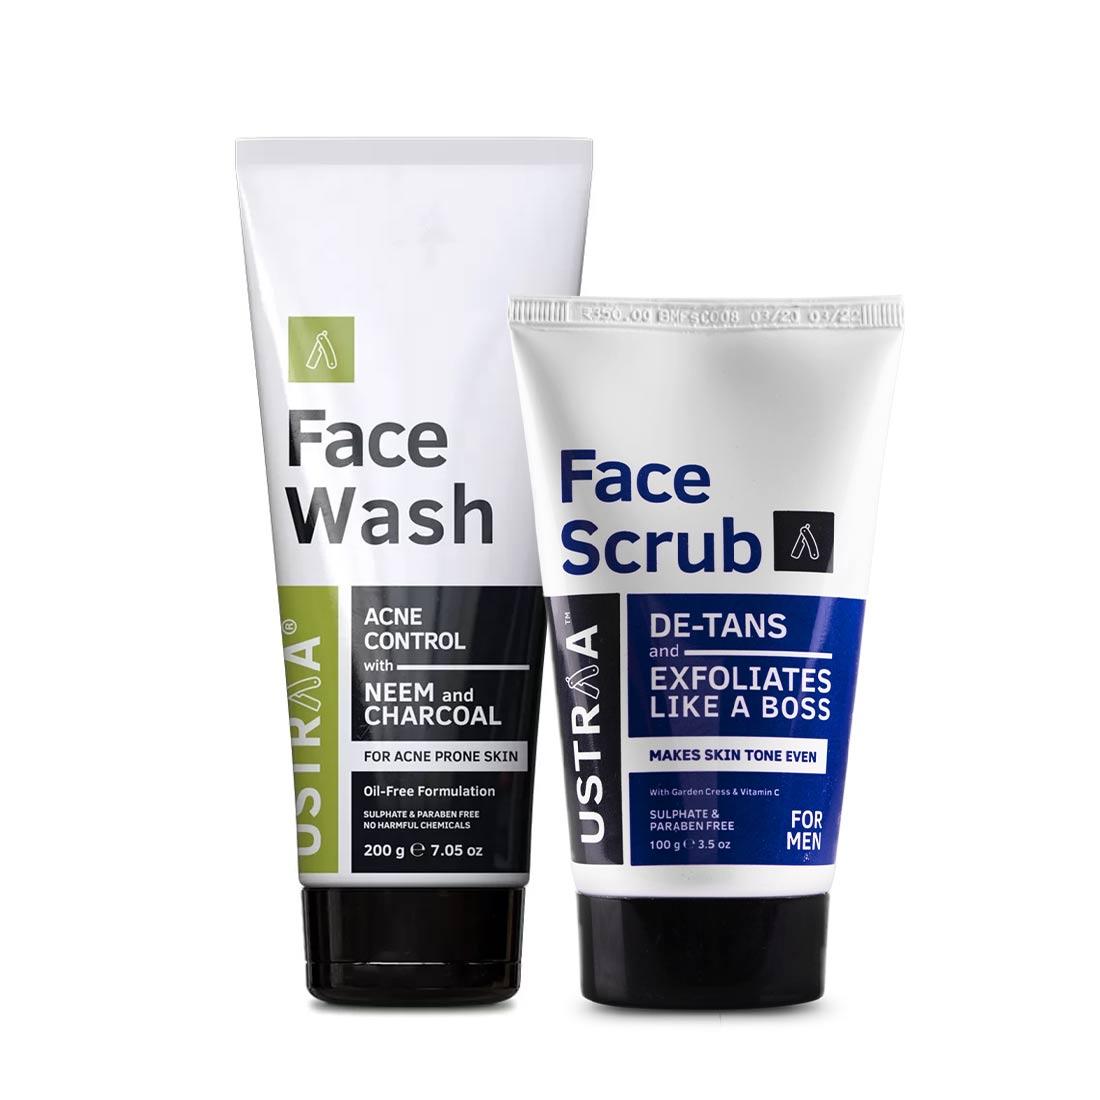 Ustraa | Ustraa Face Wash Neem & Charcoal 200g & De Tan Face Scrub 100g